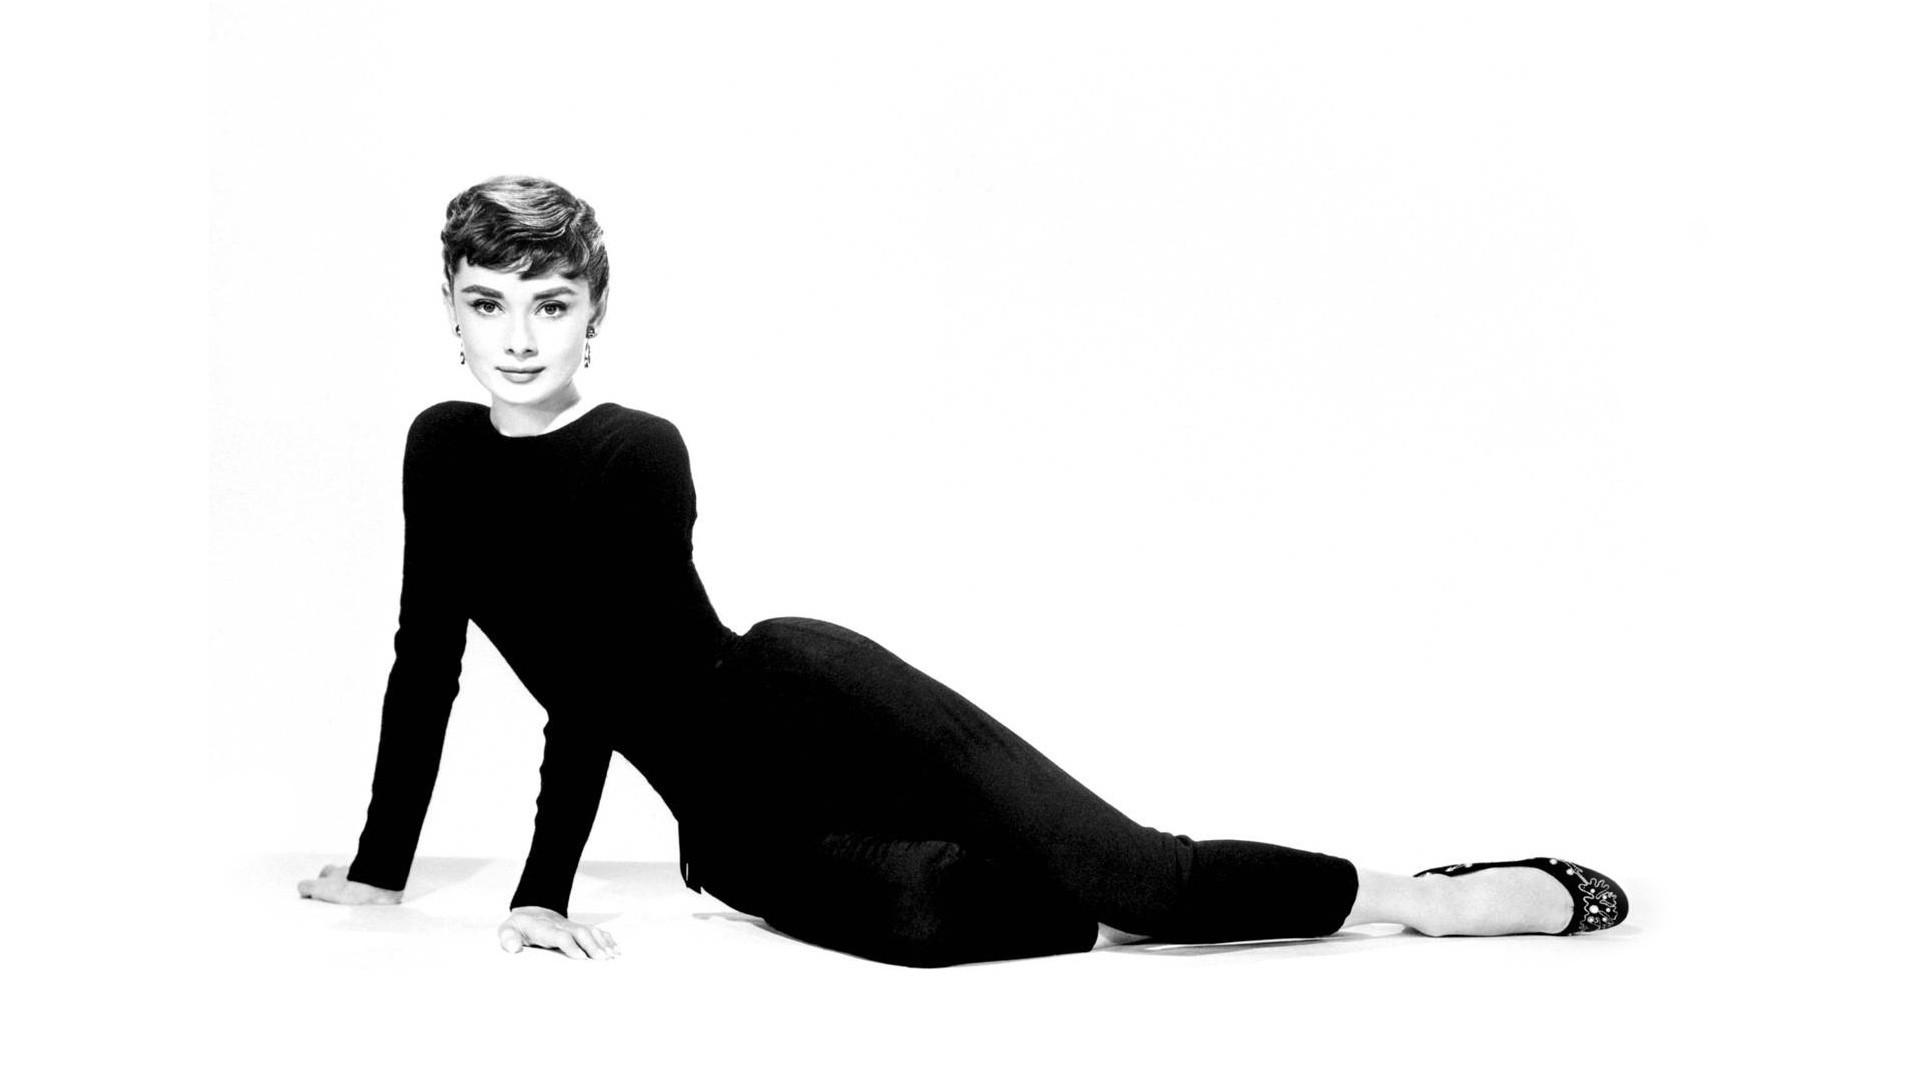 Audrey Hepburn Background   Wallpaper High Definition High Quality 1920x1080